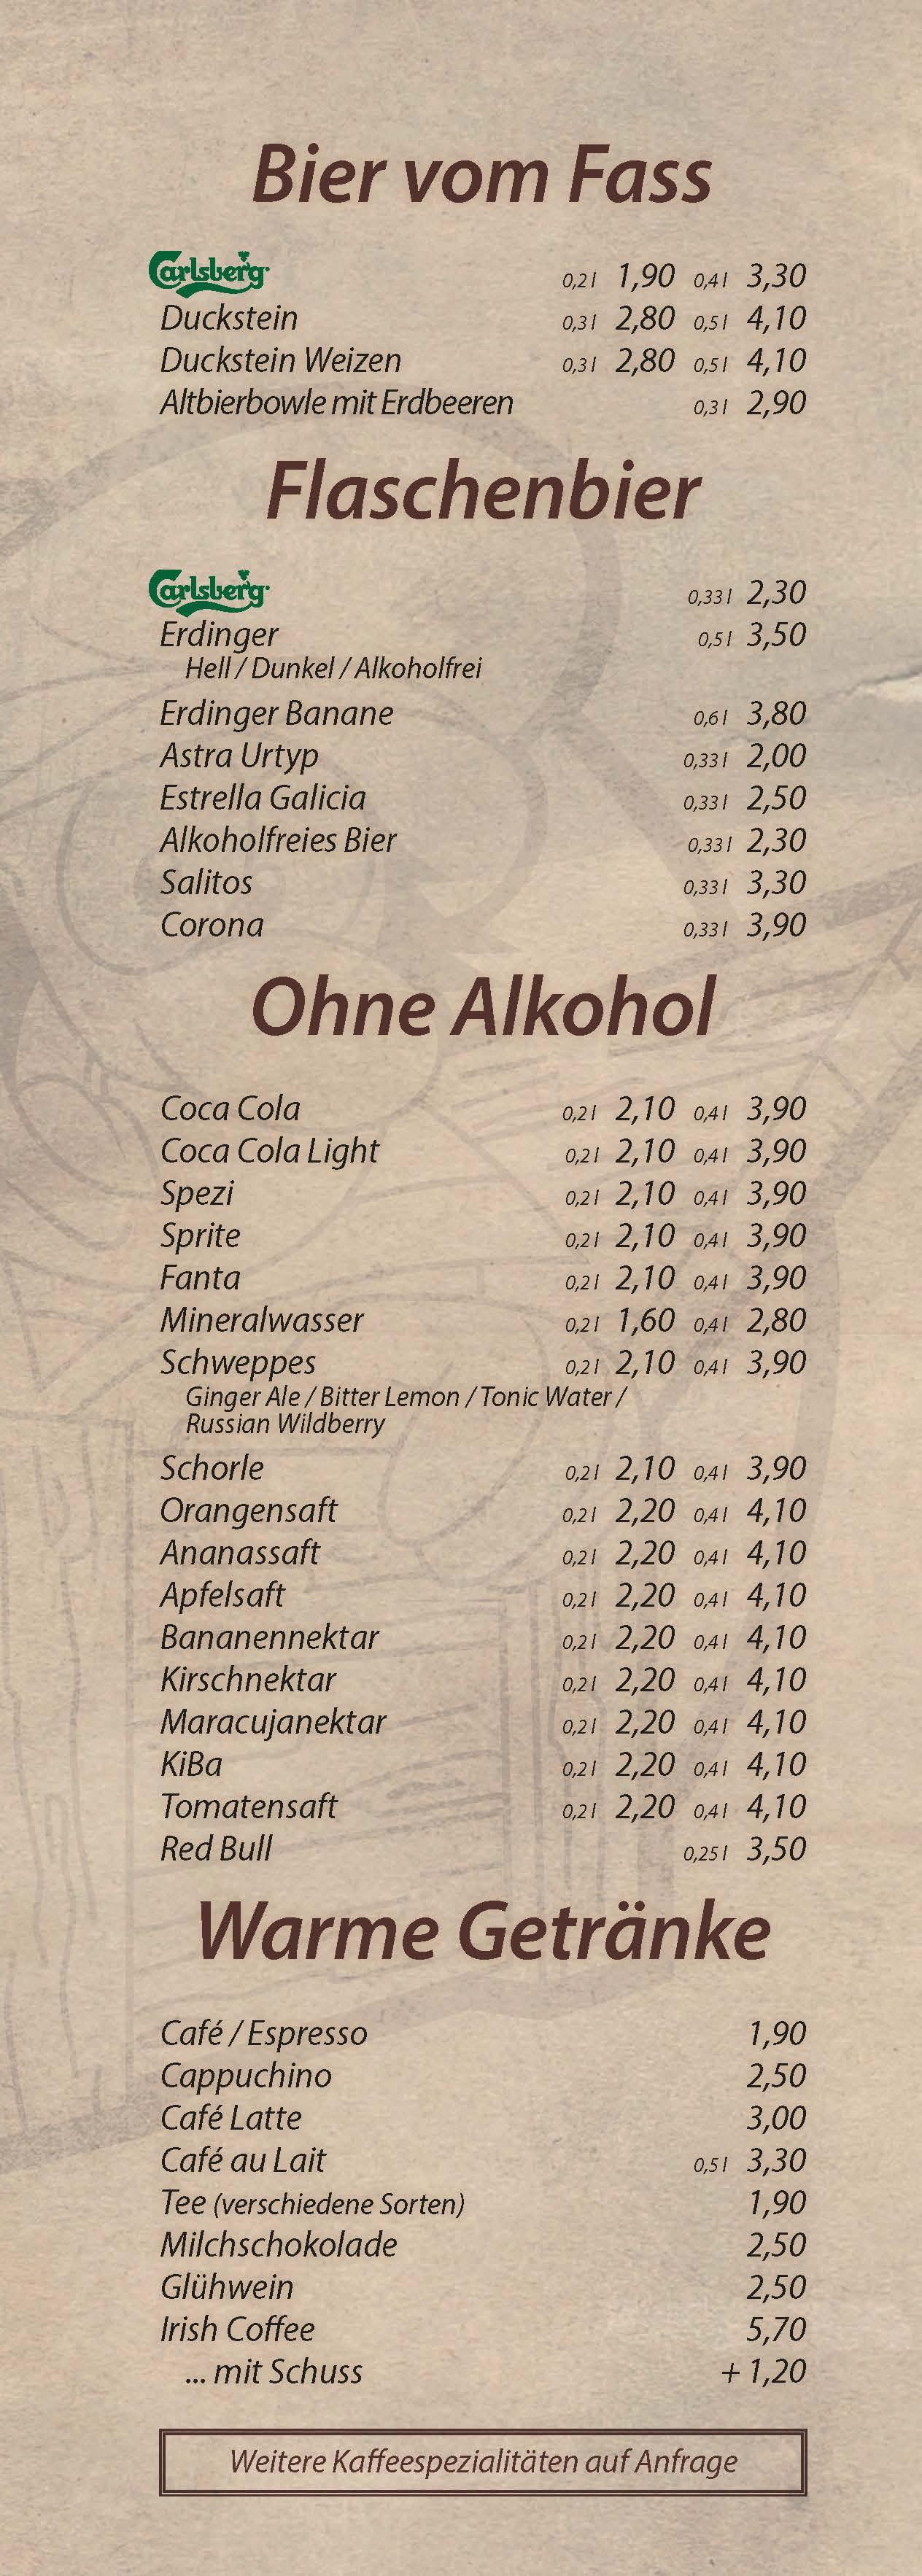 Bier, warme Getränke - Cocktailbar Die Kiste in Cuxhaven